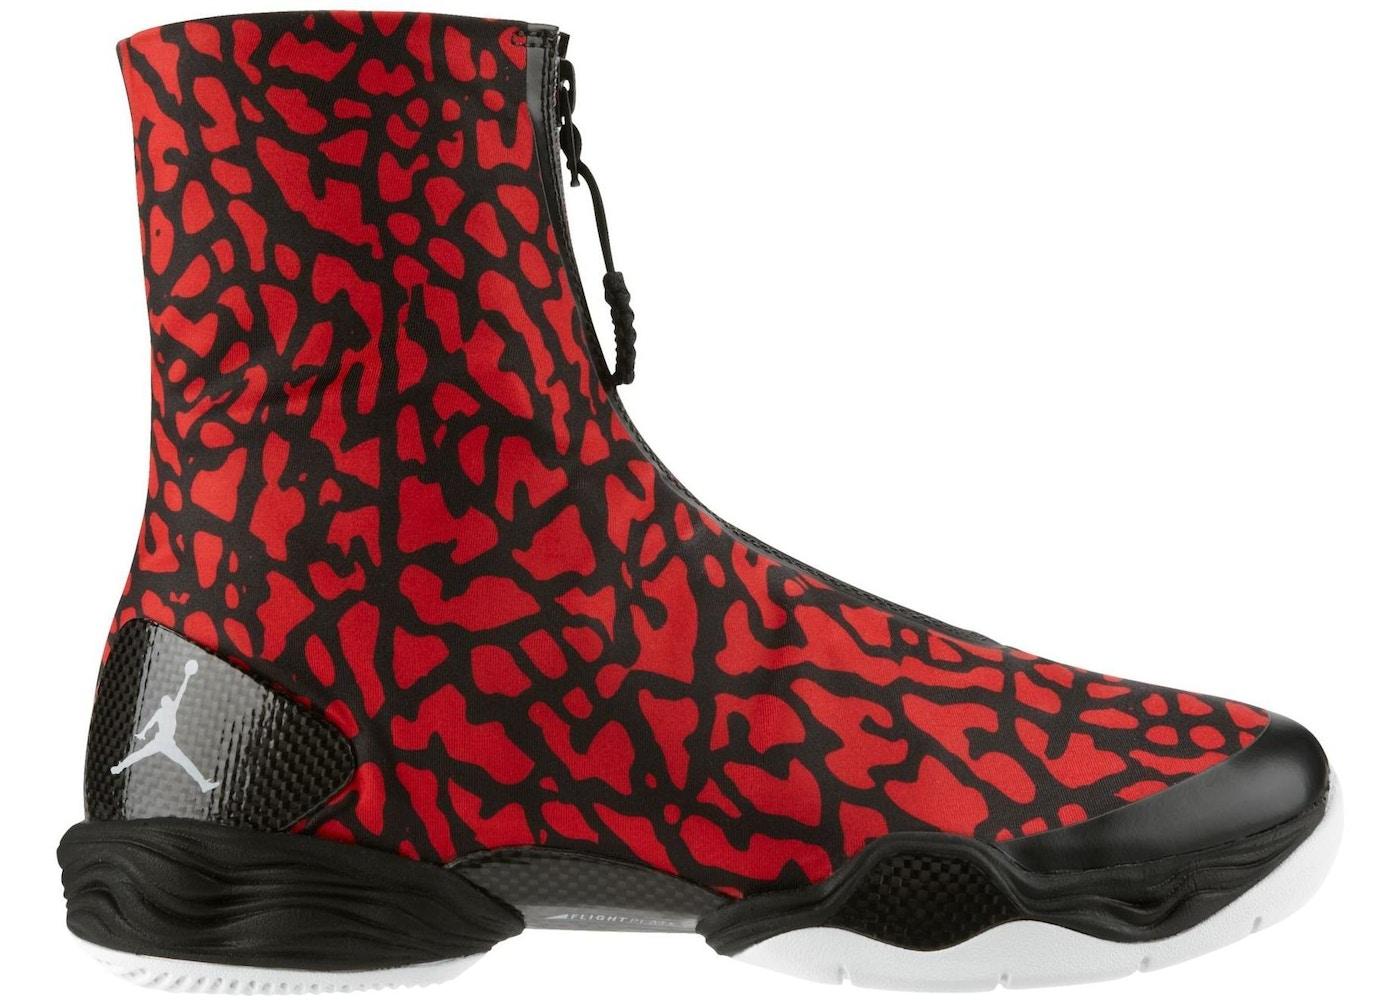 newest a7c58 c9487 Buy Air Jordan 28 Shoes & Deadstock Sneakers